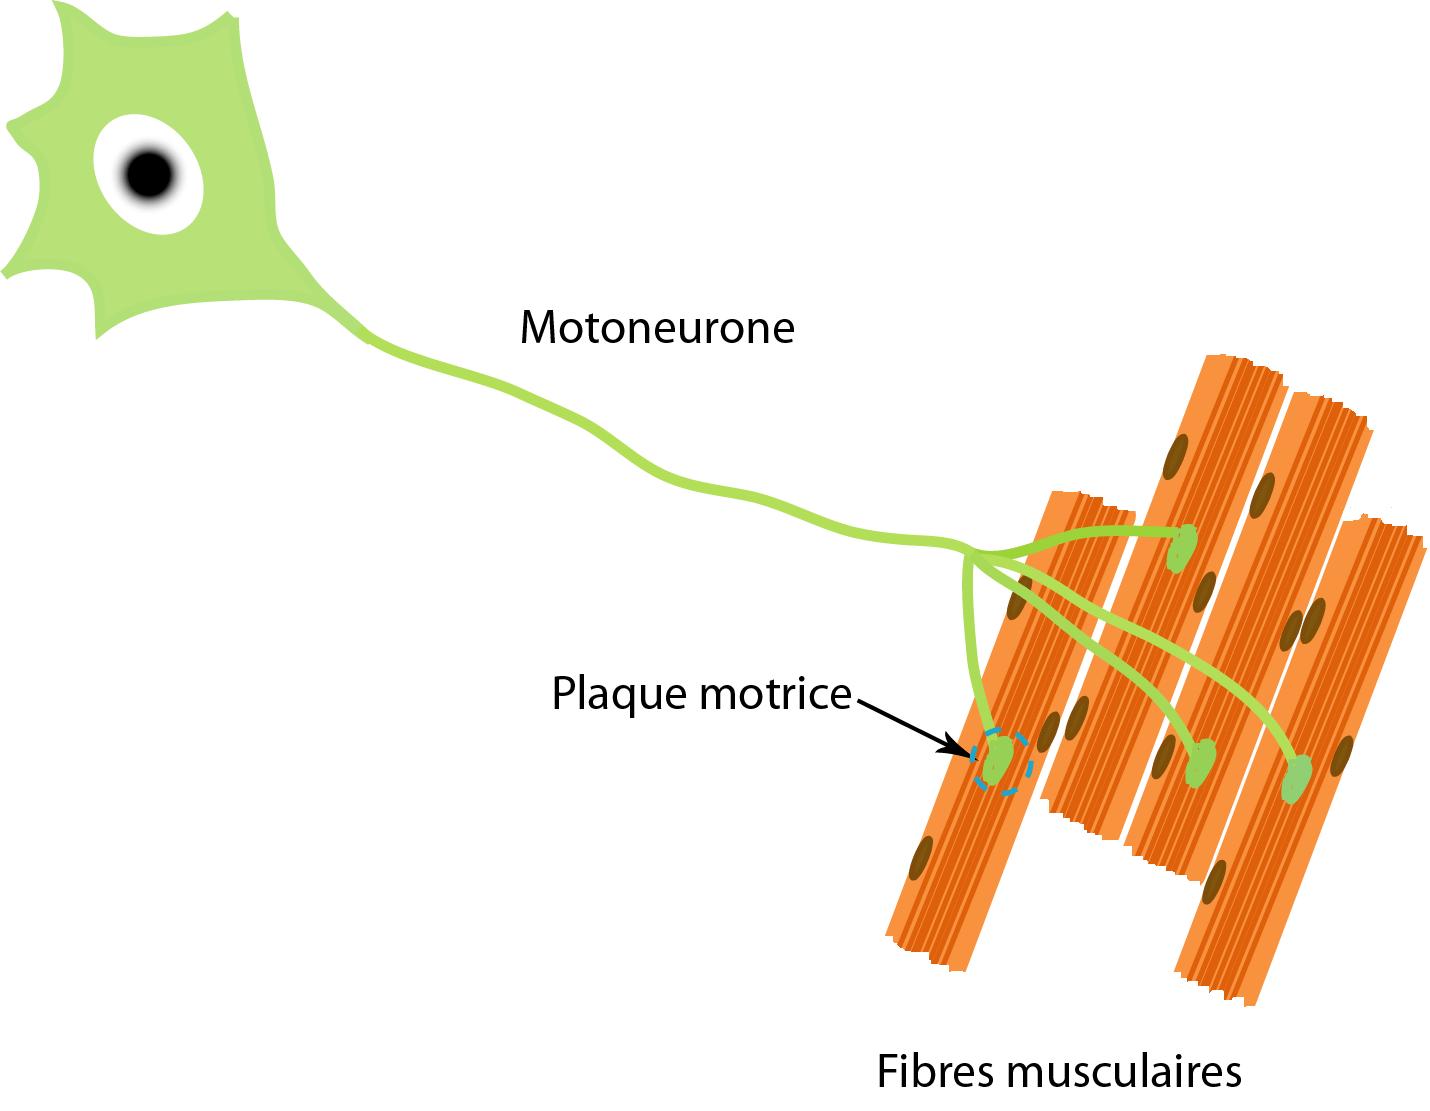 Las motoneuronas en situación de sarco-dinapenia